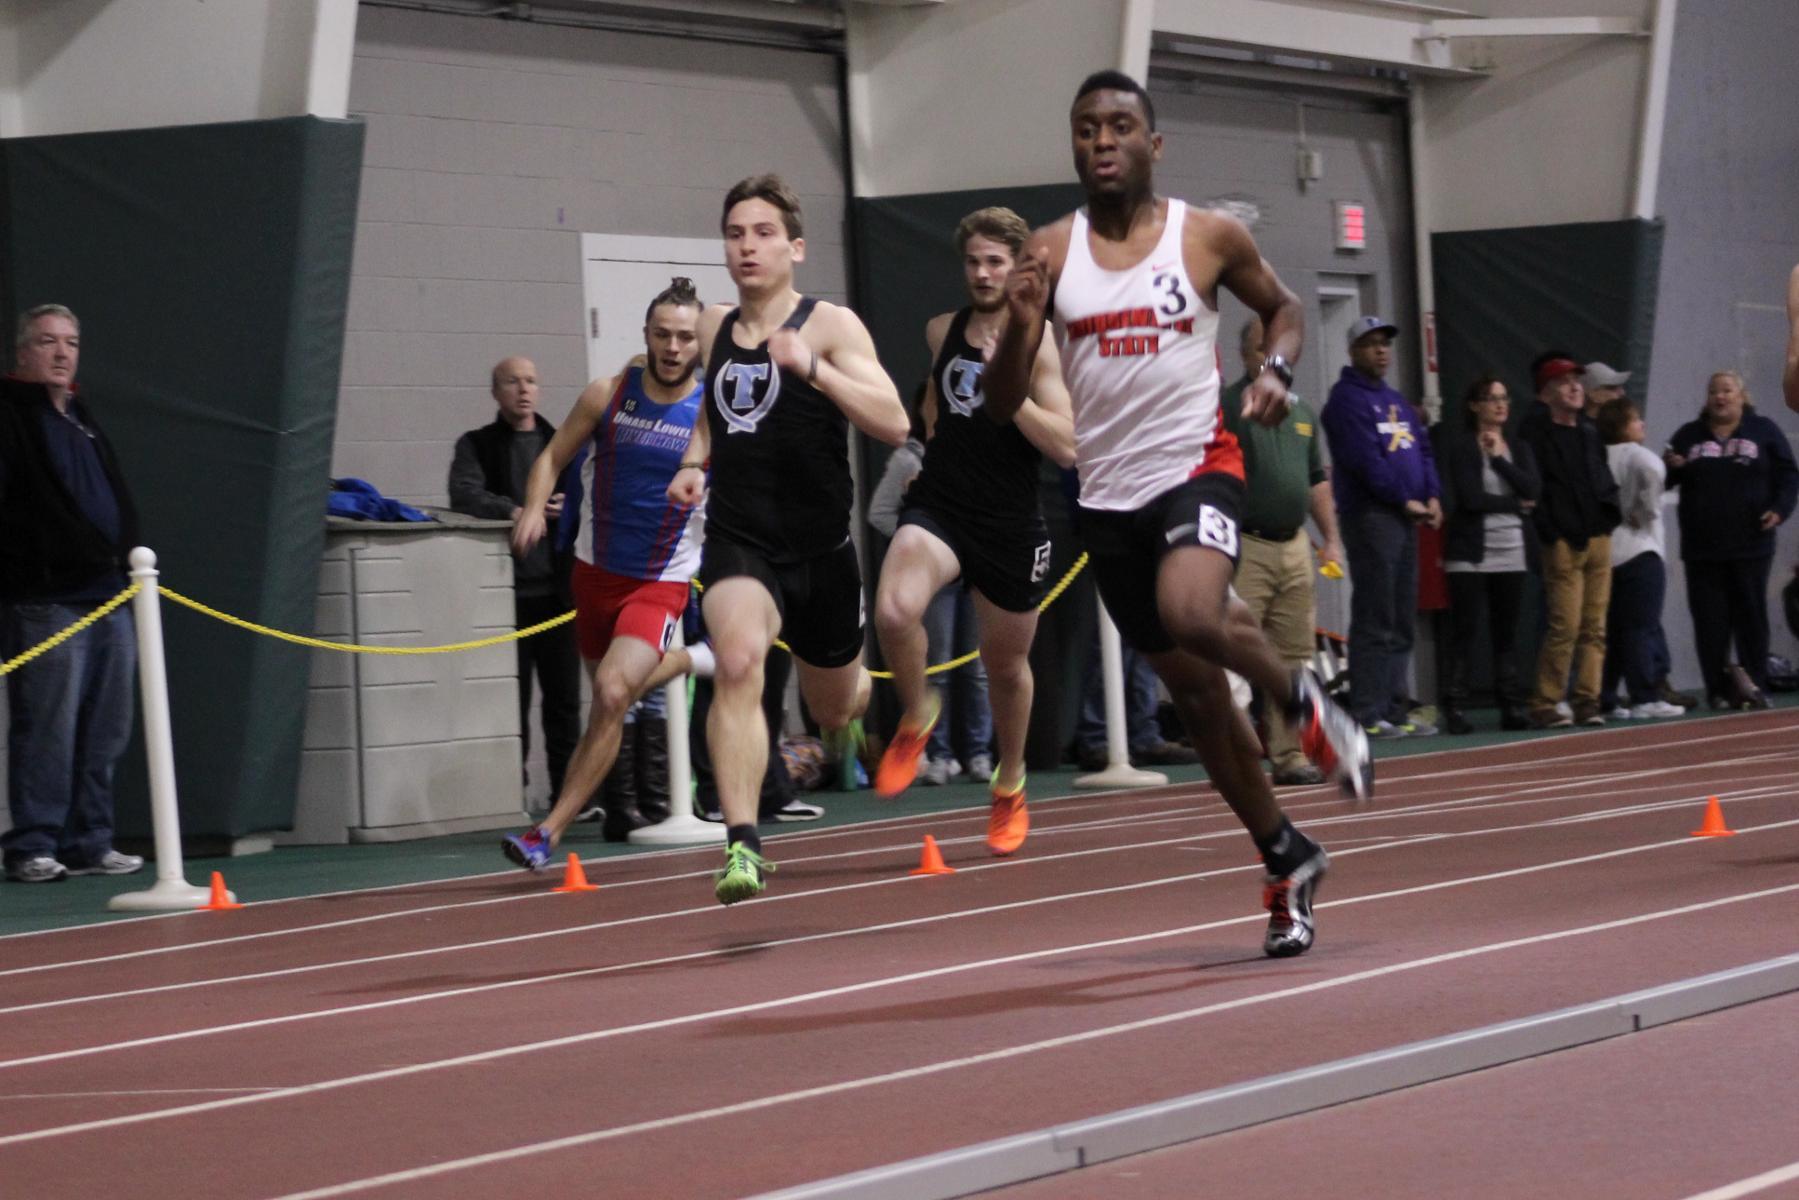 tufts track meet january 2016